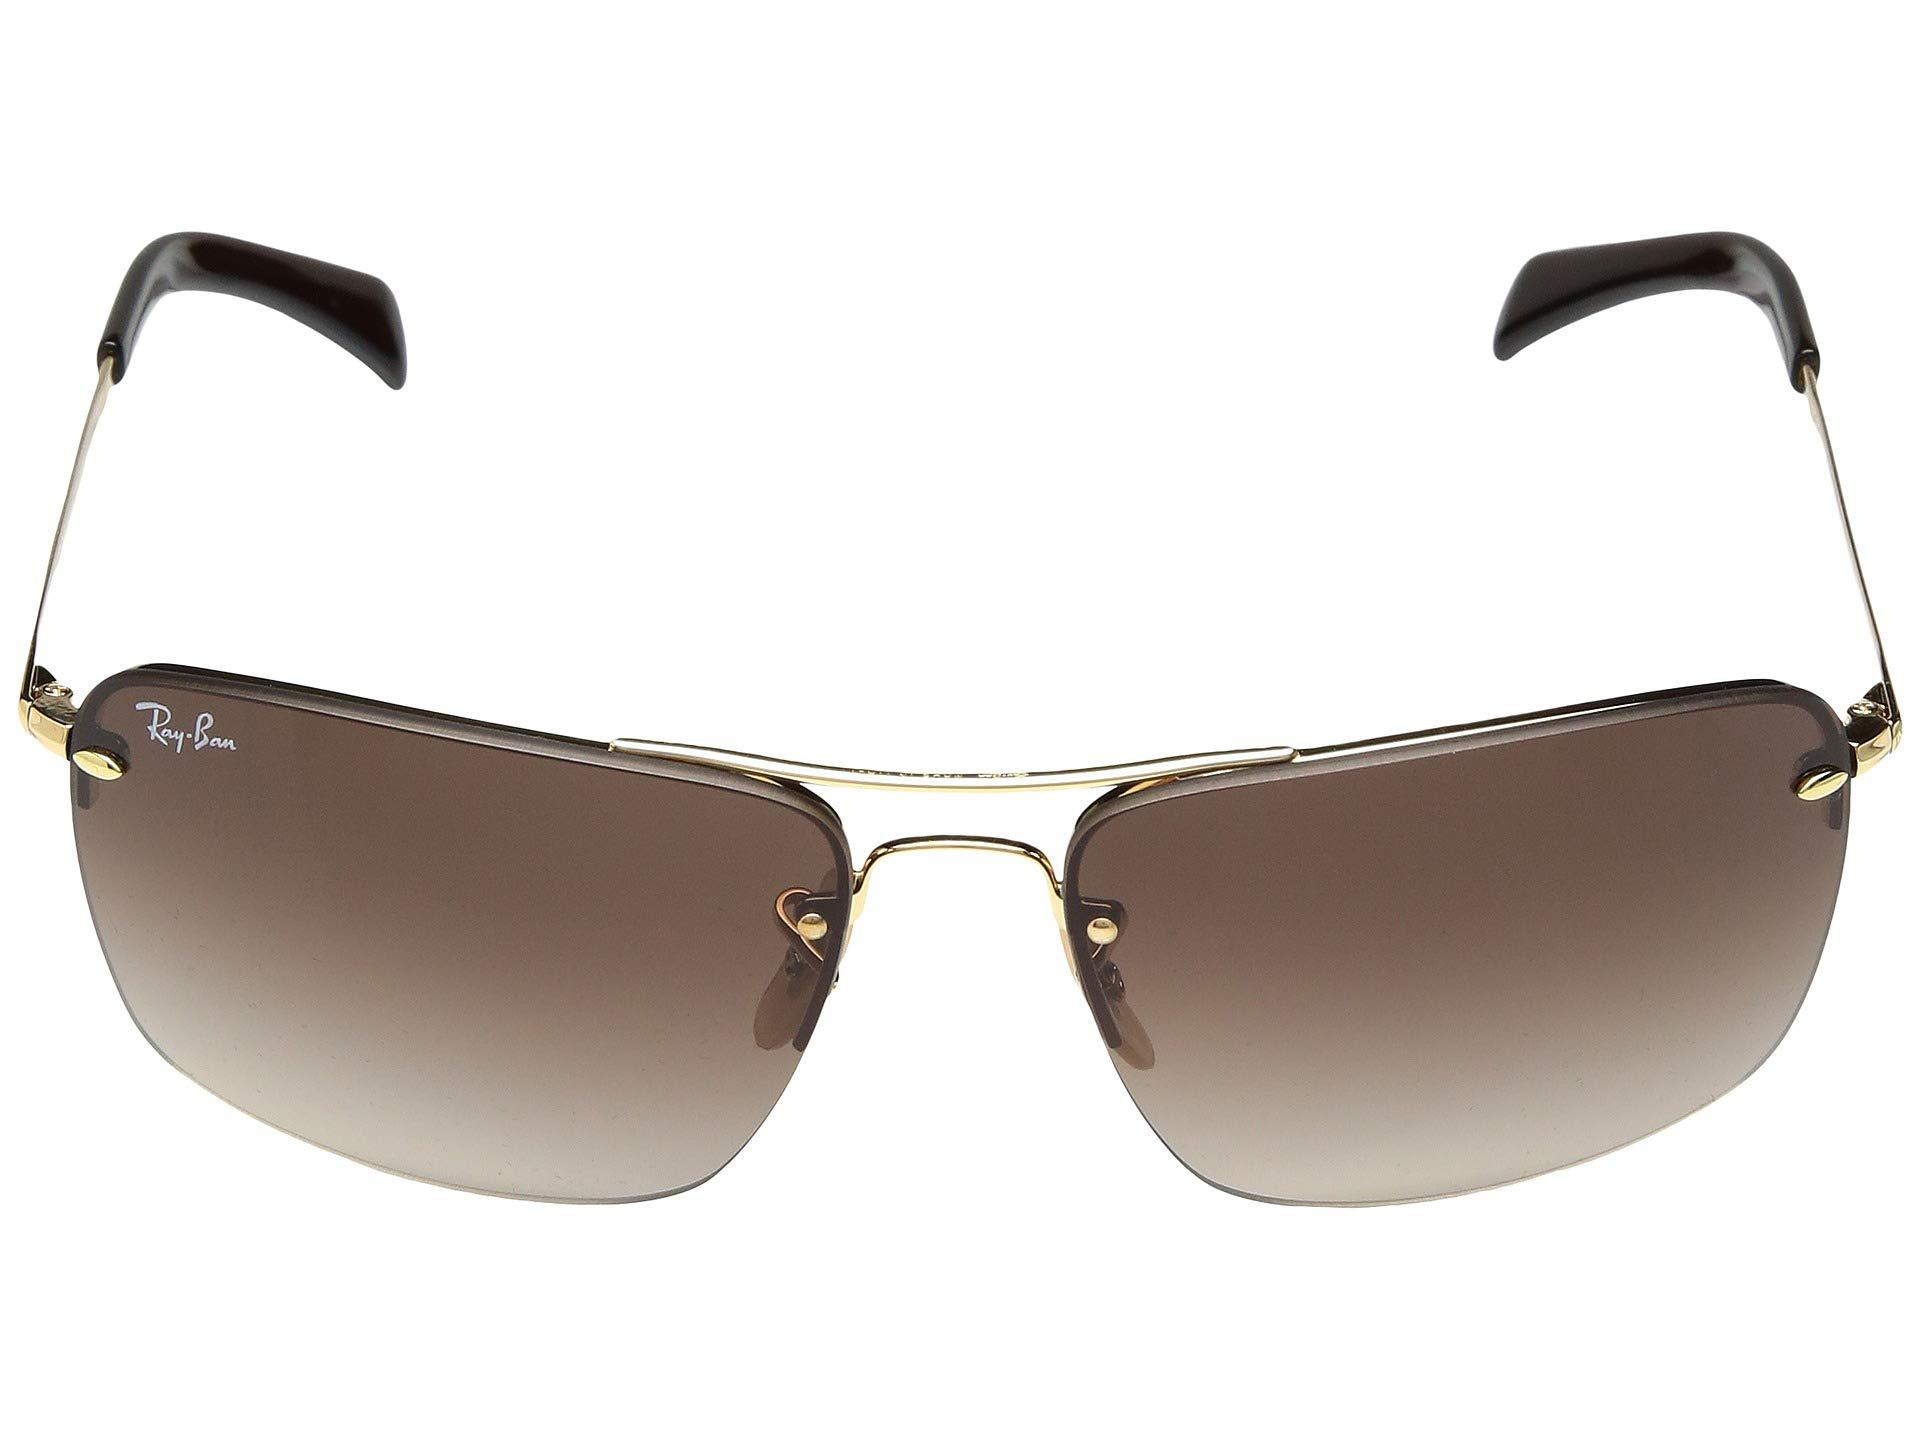 bdf9079b4b Lyst - Ray-Ban Rb3607 61 Mm. (black dark Green) Fashion Sunglasses ...